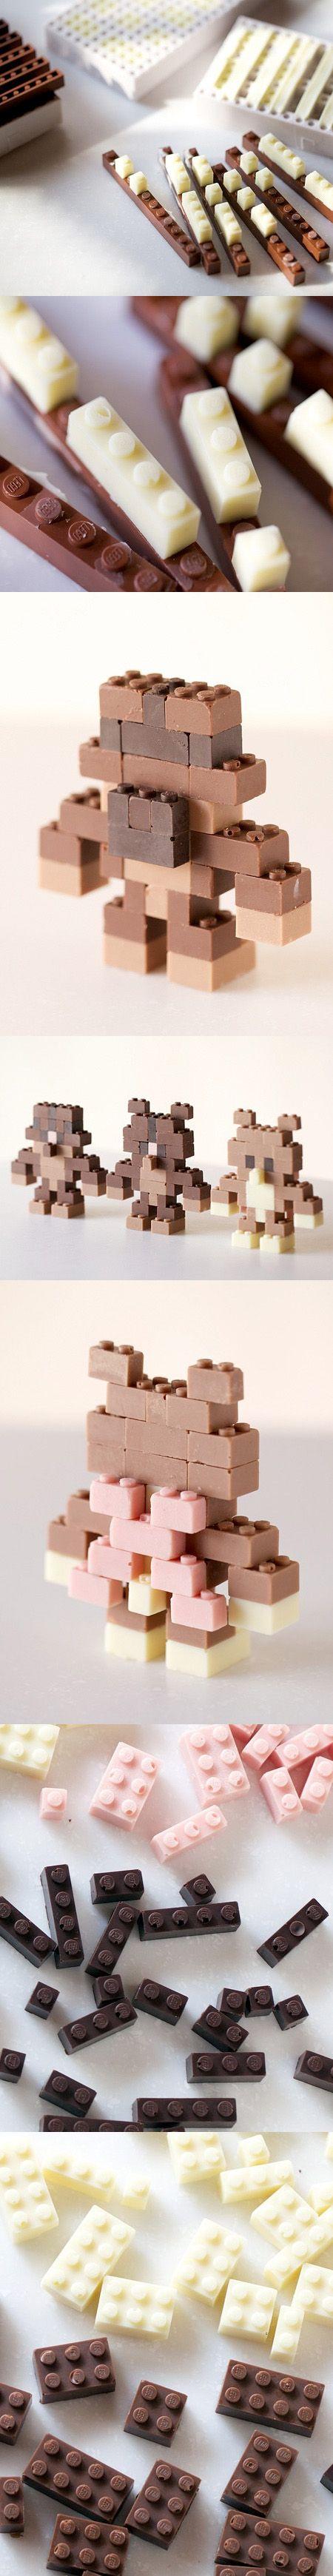 Chocolate LEGO / https://www.behance.net/sparebutton